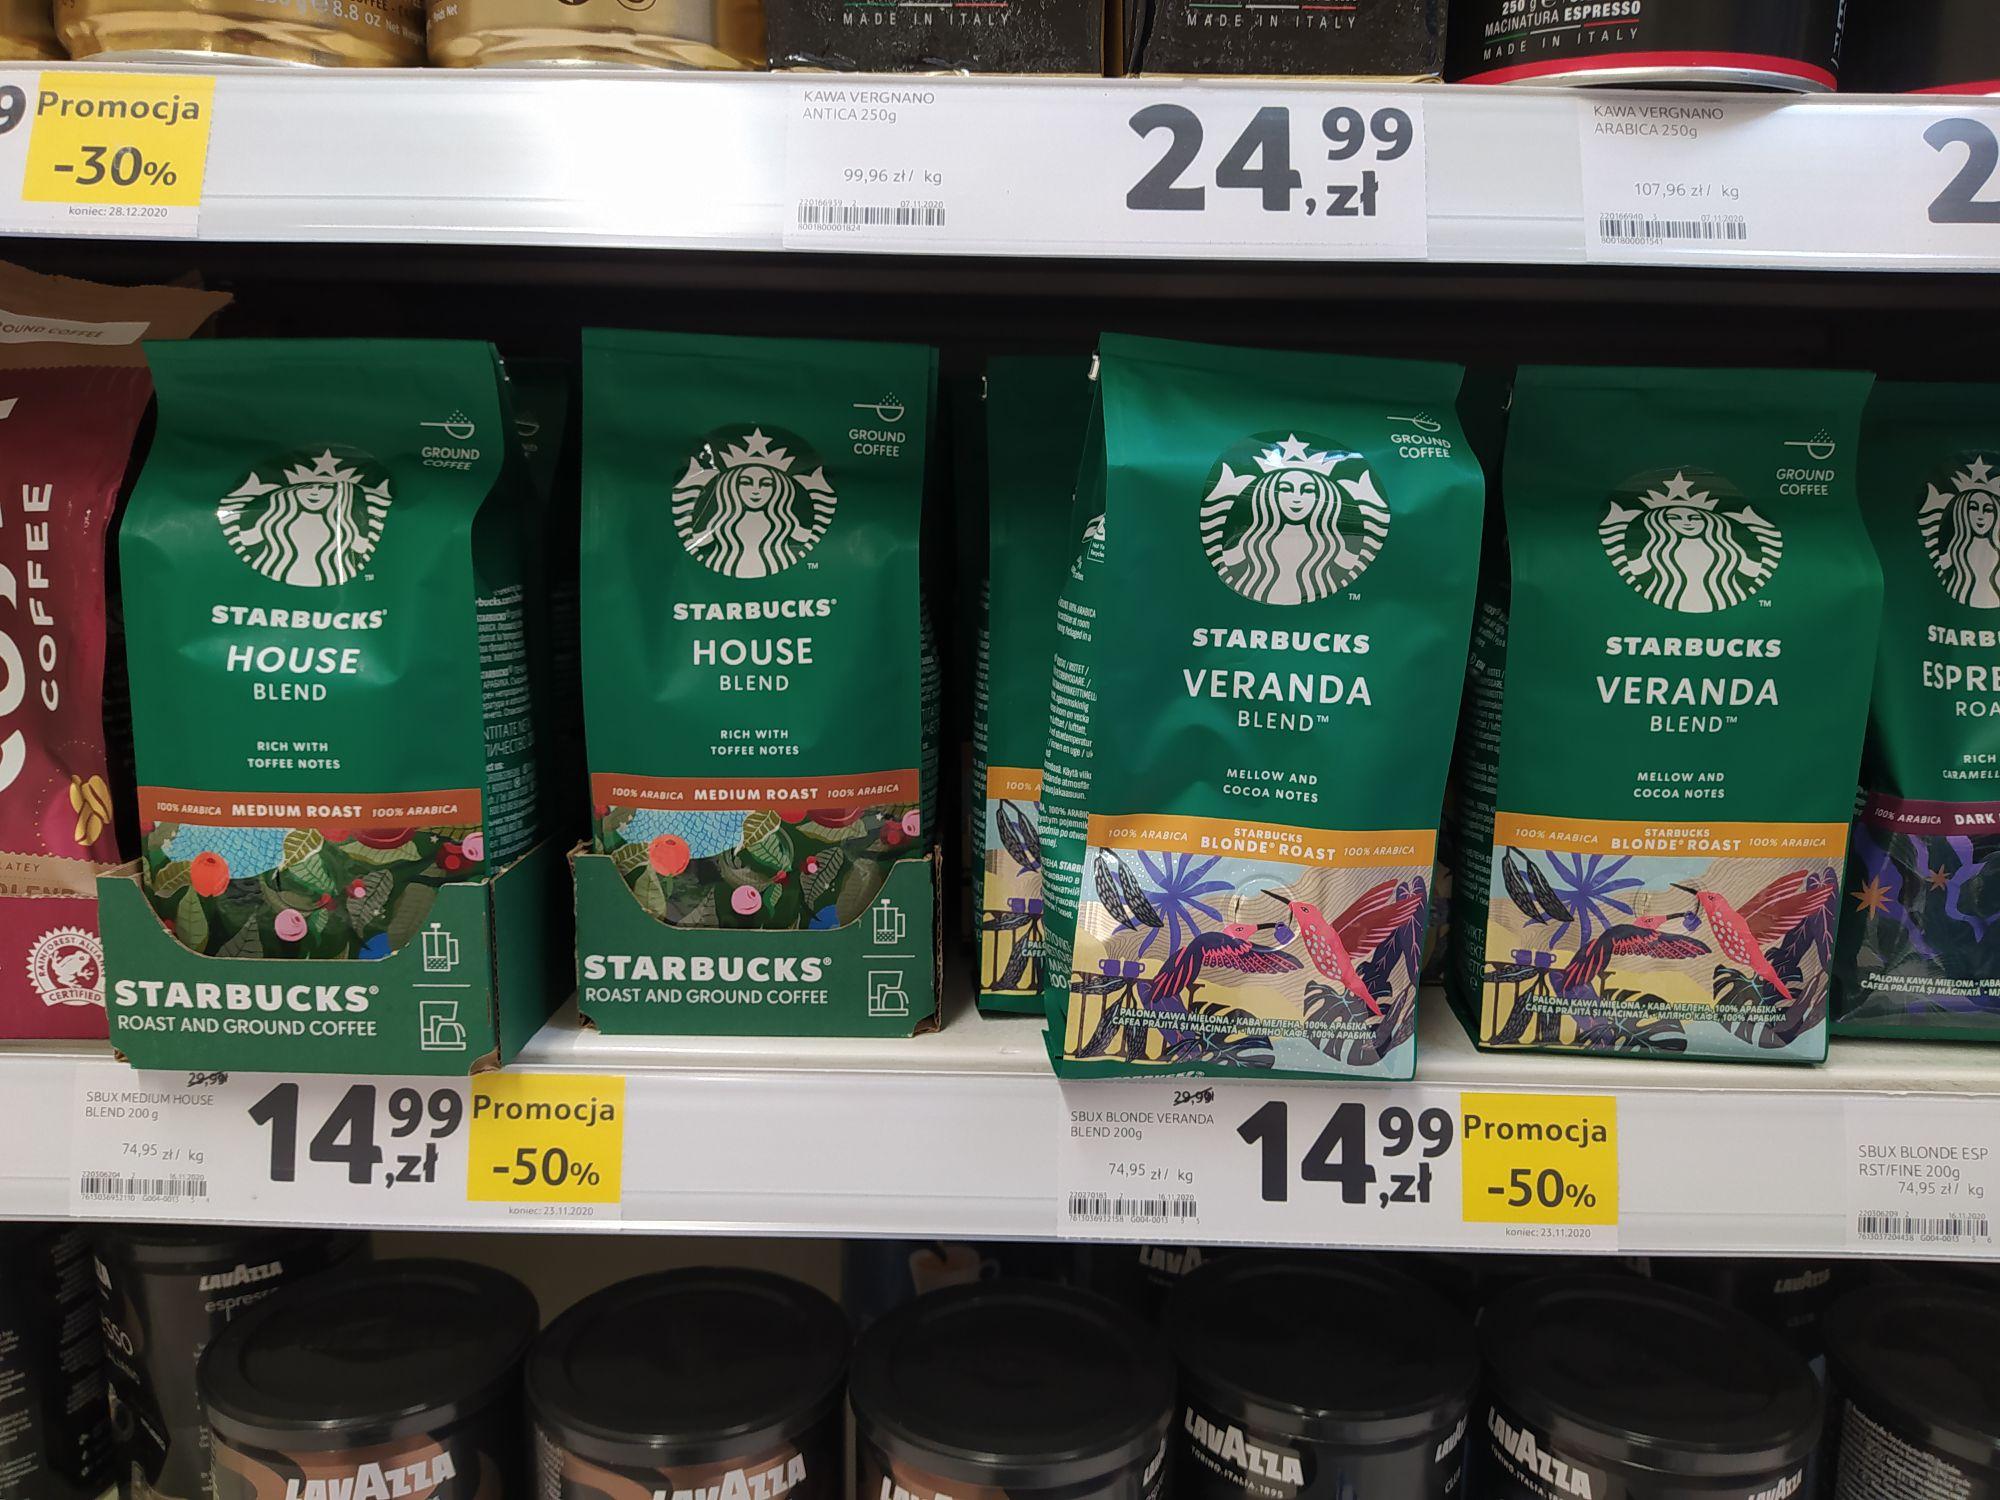 Kawa mielona Starbucks 200g tofi oraz kakao